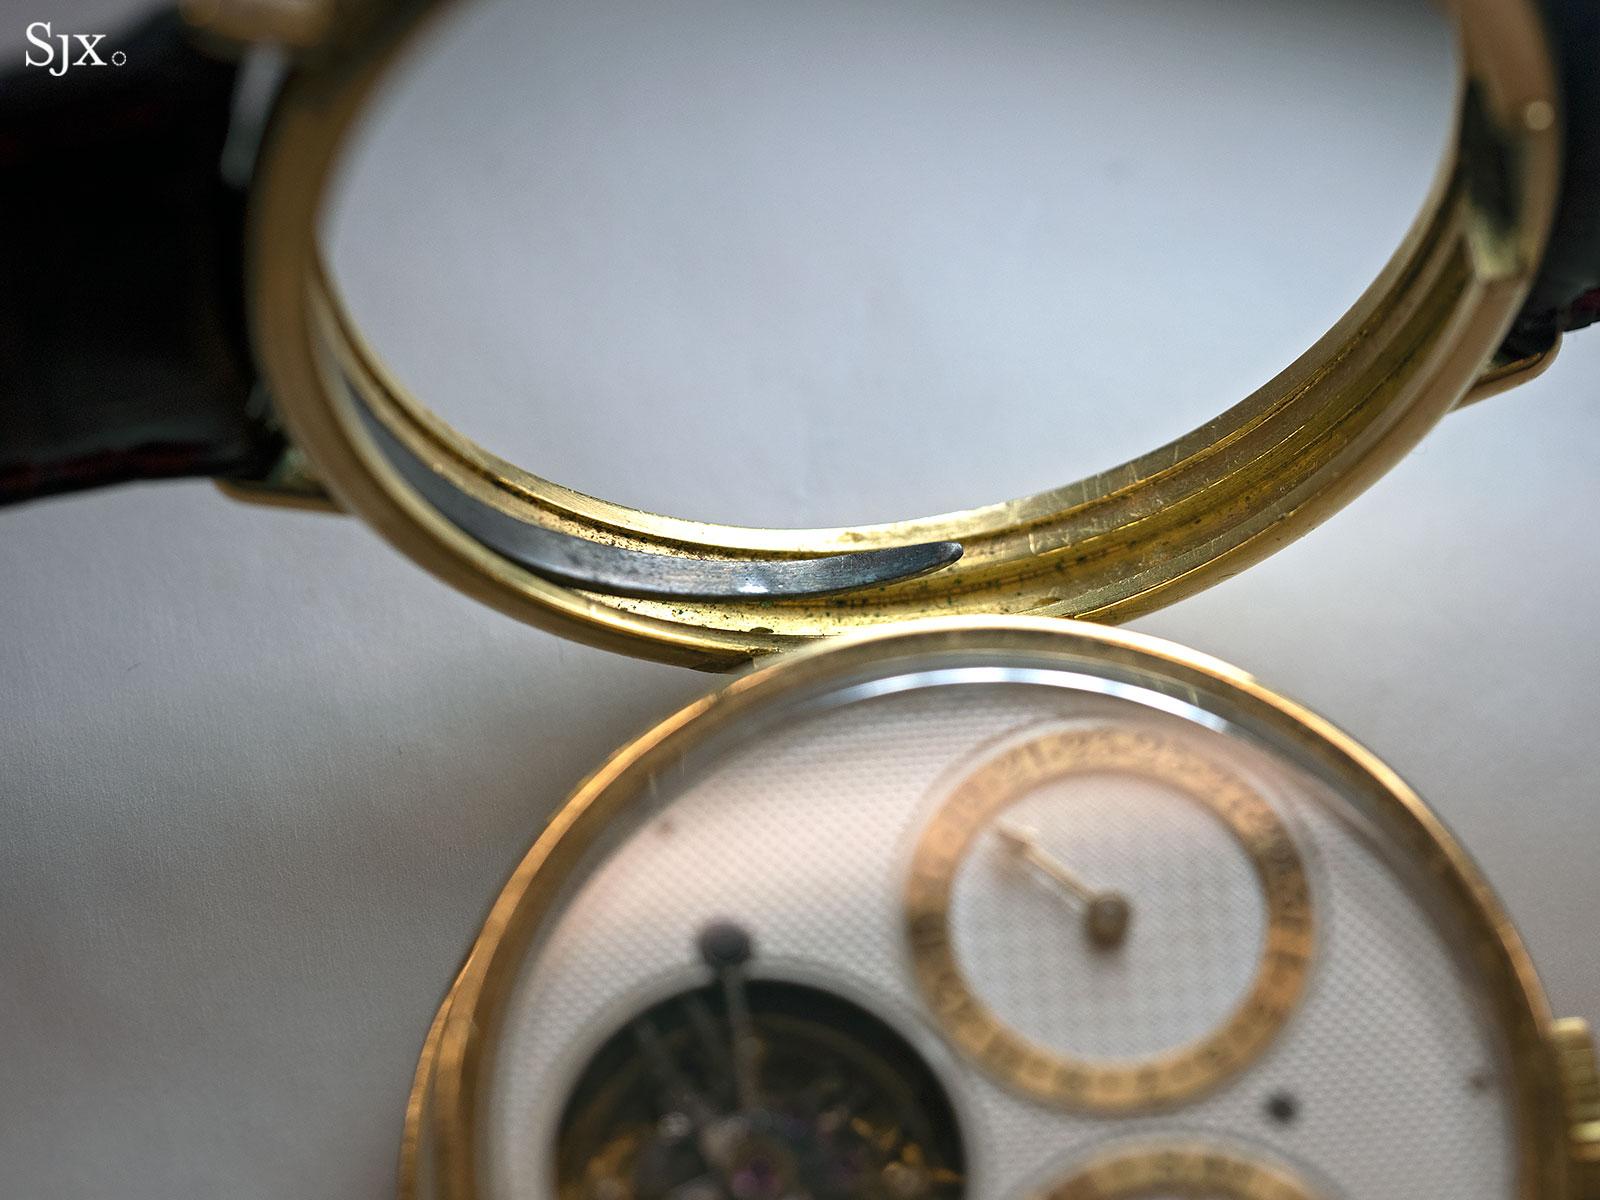 George Daniels Spring Case Tourbillon Wristwatch 13